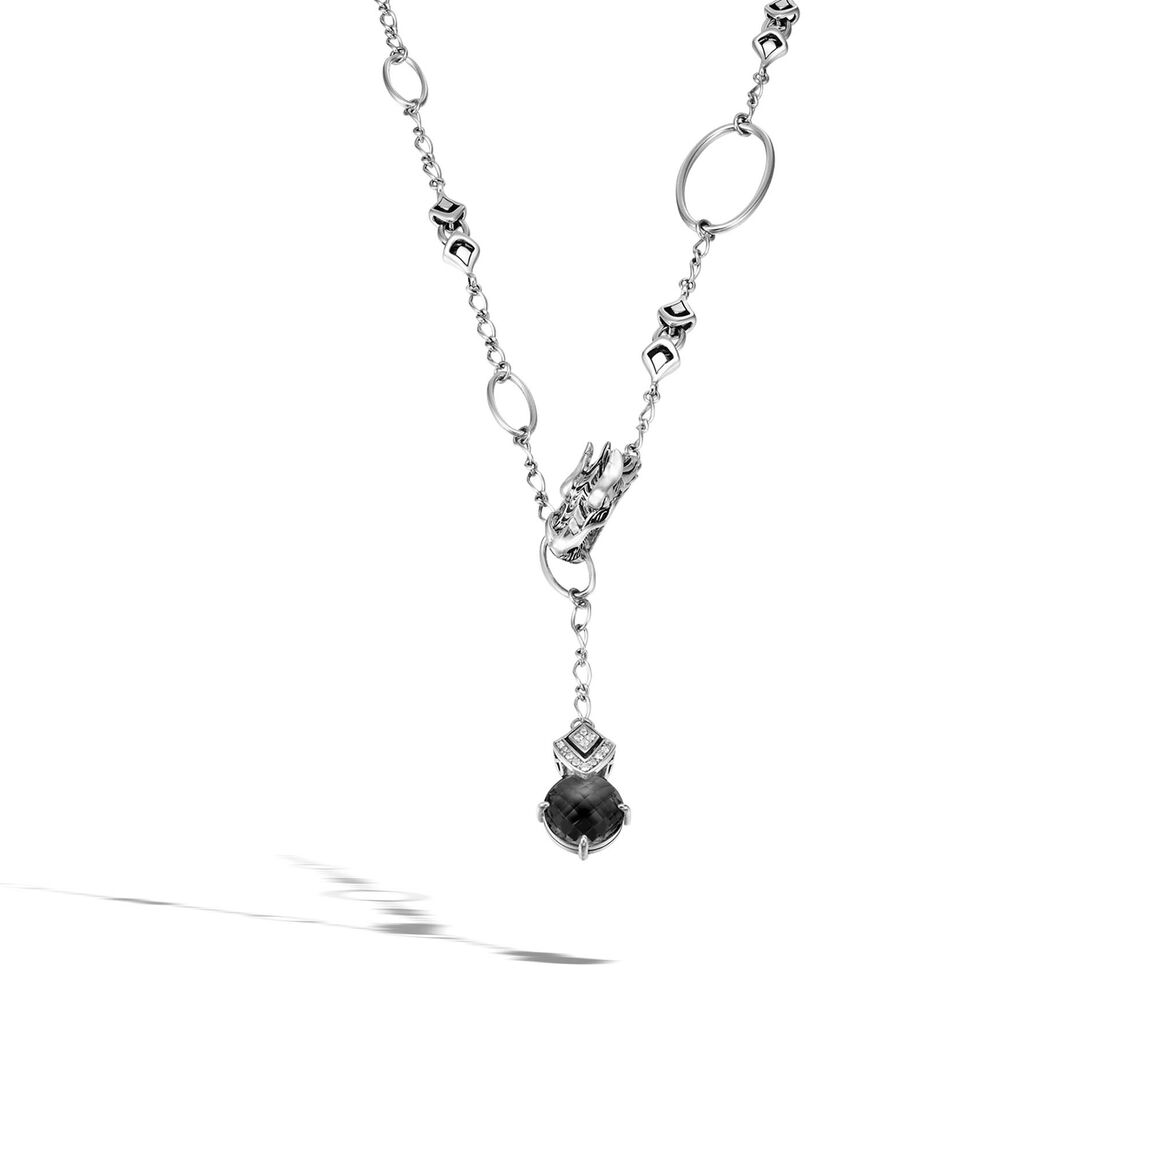 Legends Naga 4MM Drop Necklace with 14MM Gemstone